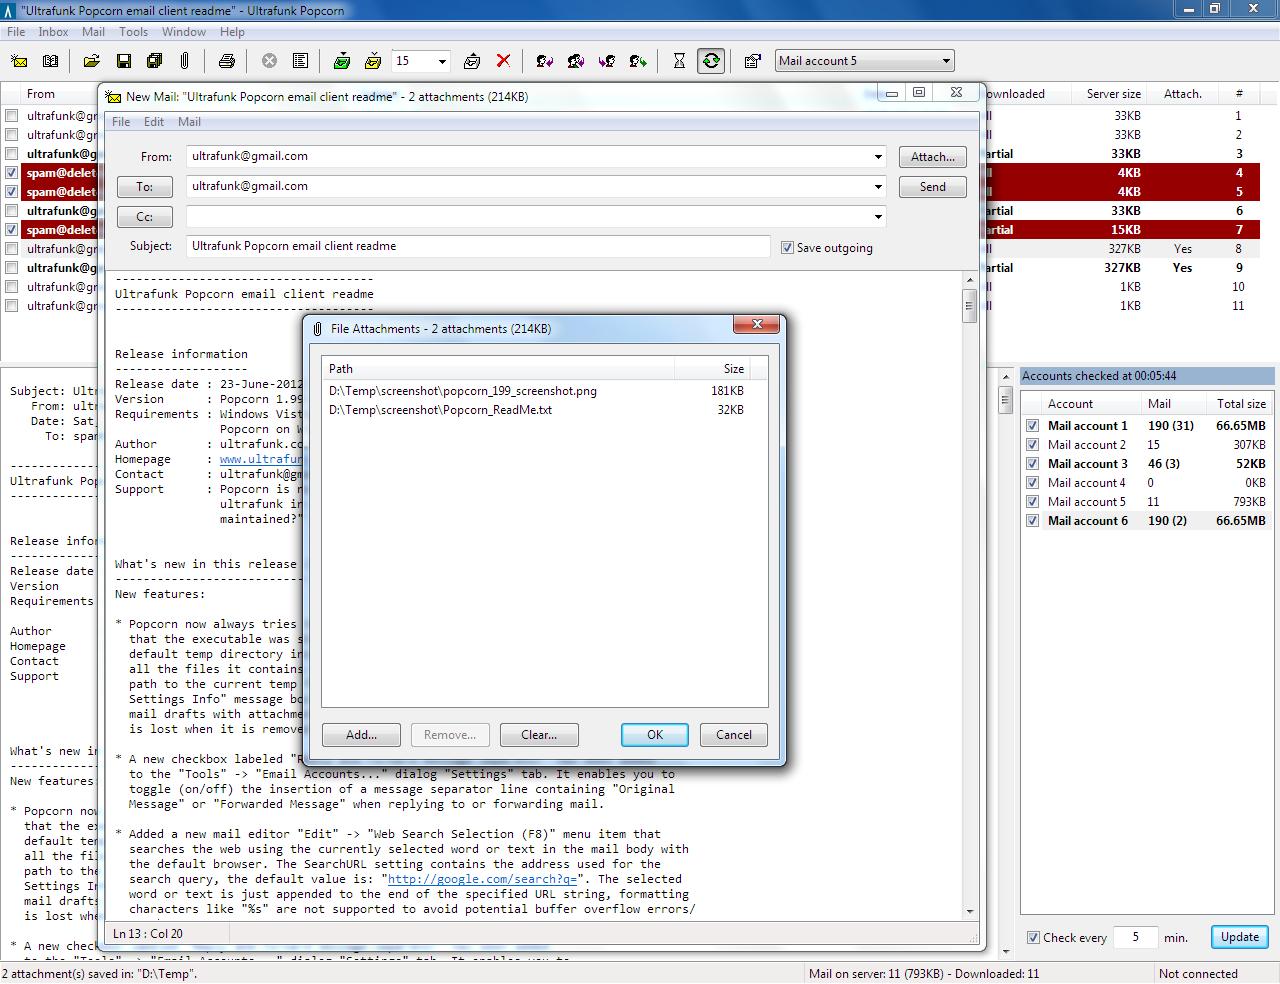 Popcorn 1.99.3 software screenshot